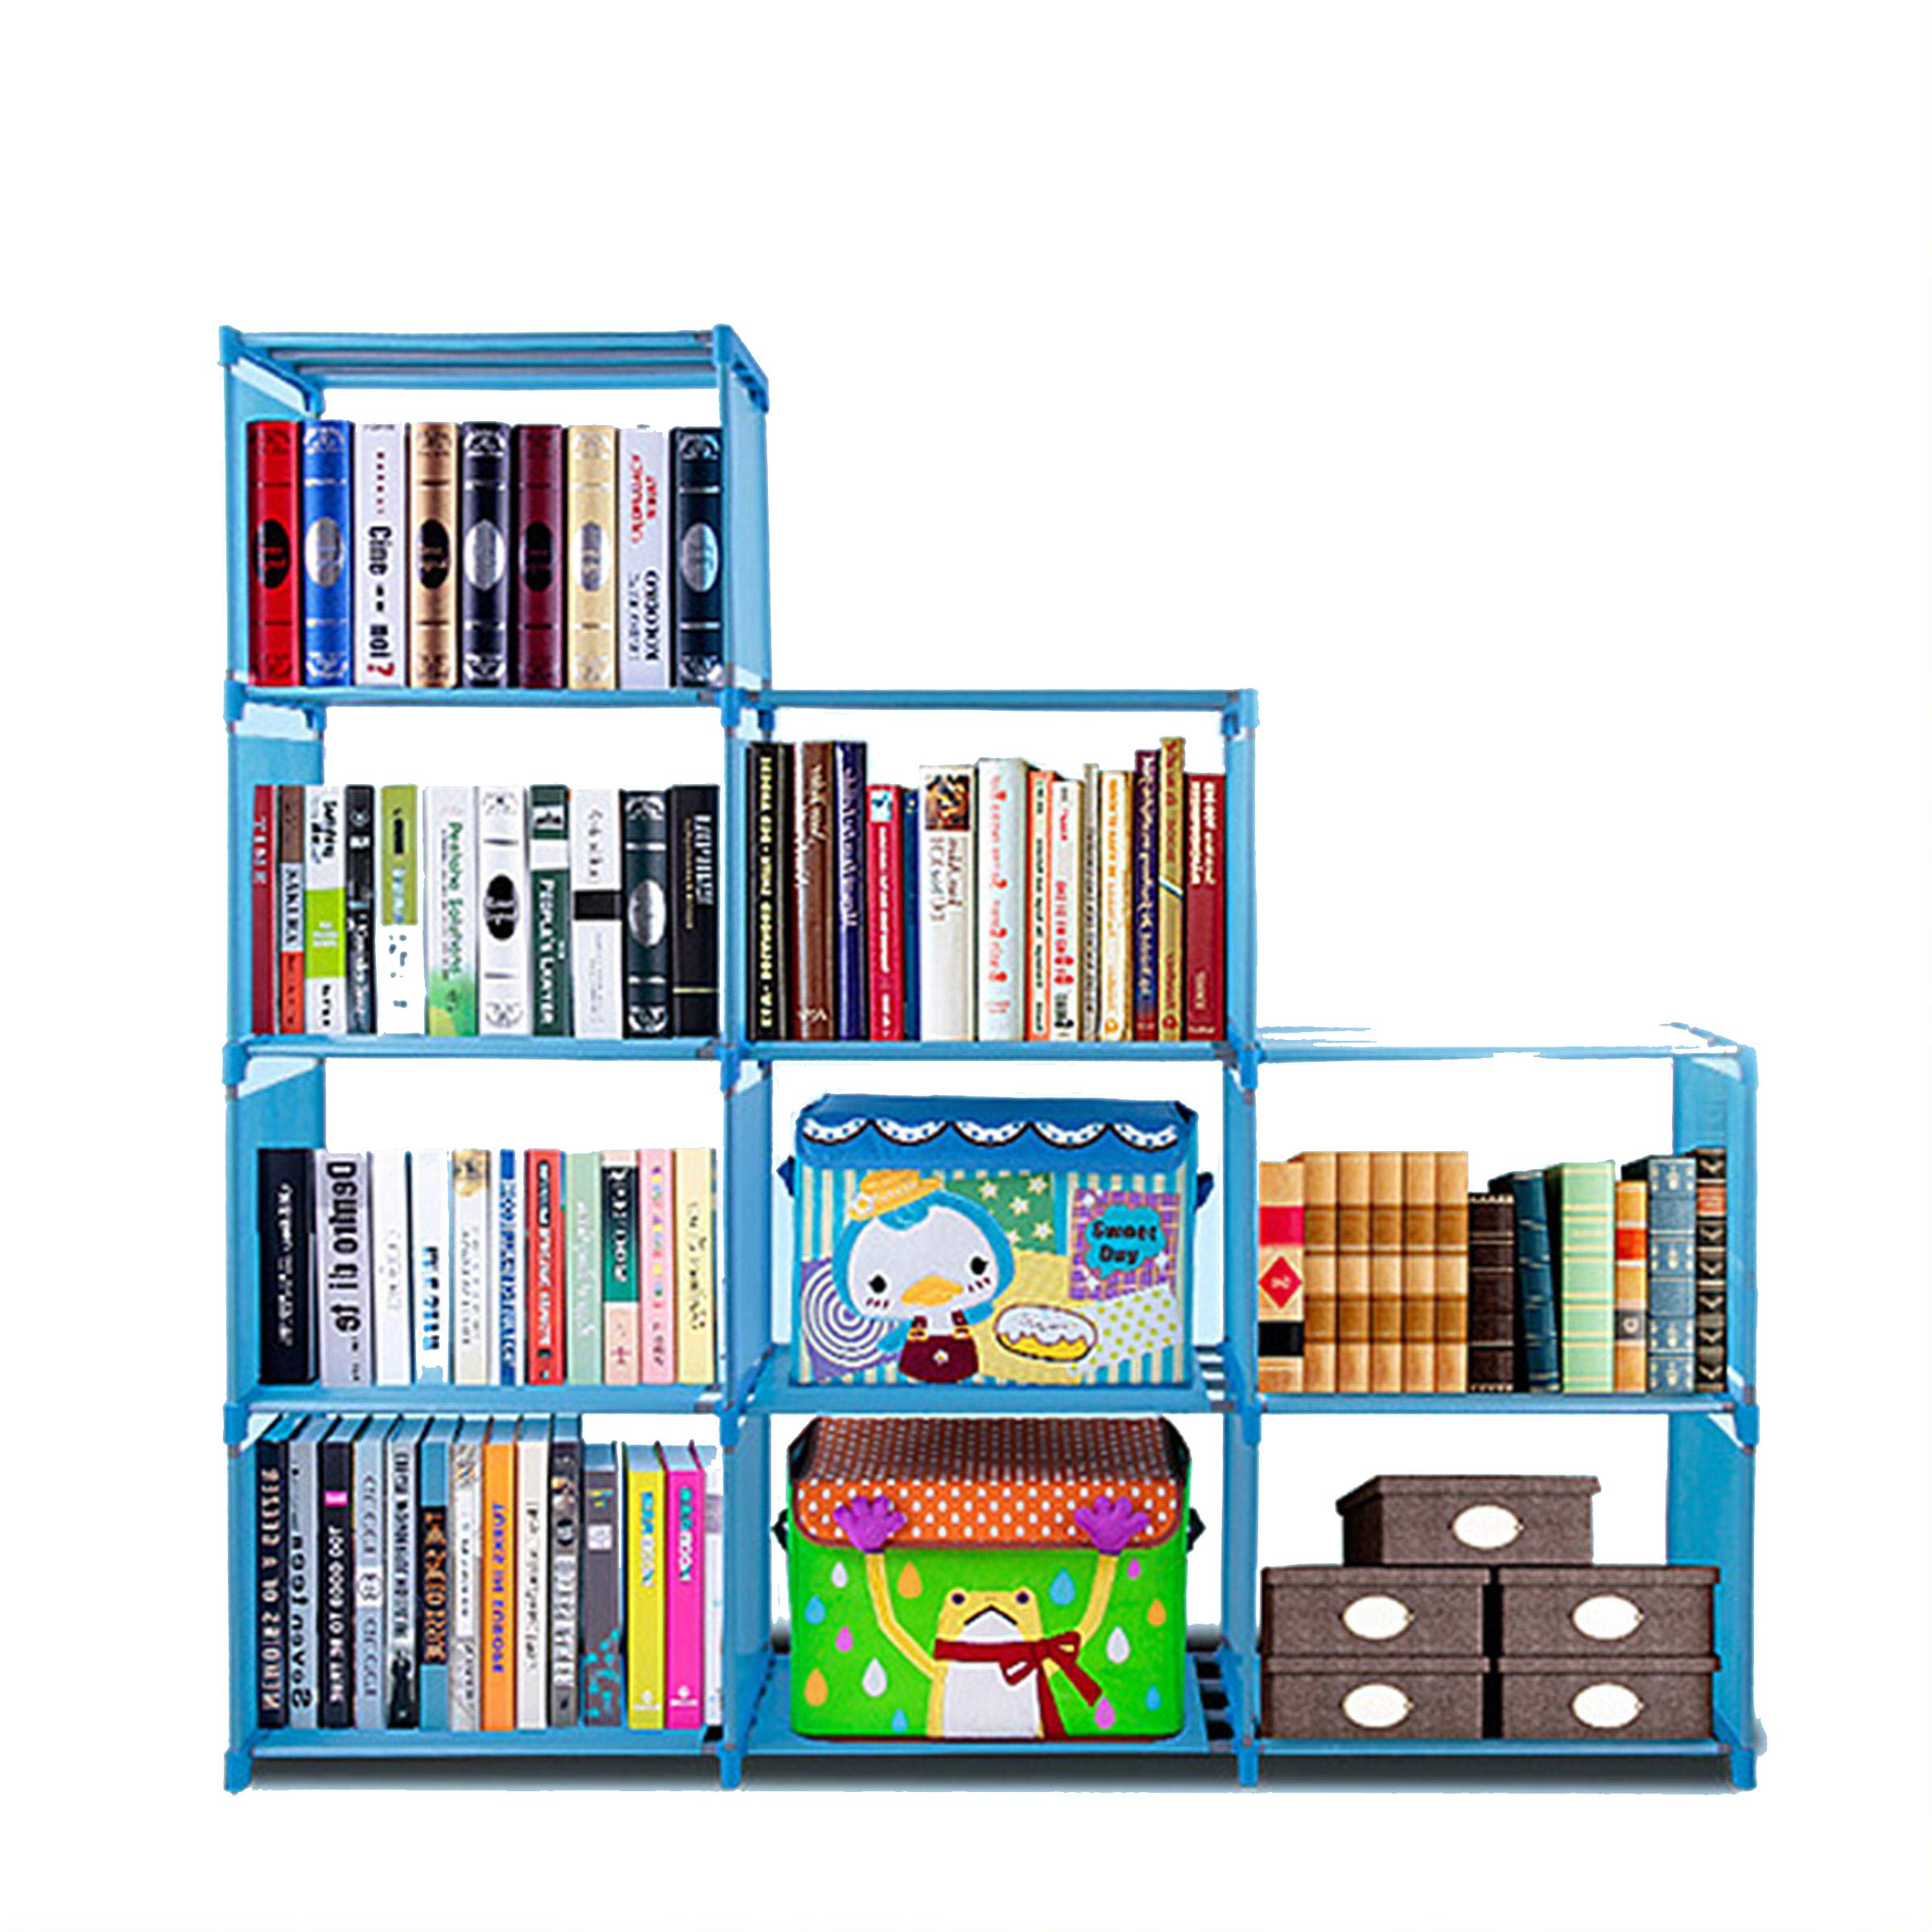 Goodfans Adjustable Multifunction Home Furniture Bookcase Storage DIY Book Shelves with 9 Shelves, Home Furniture Storage